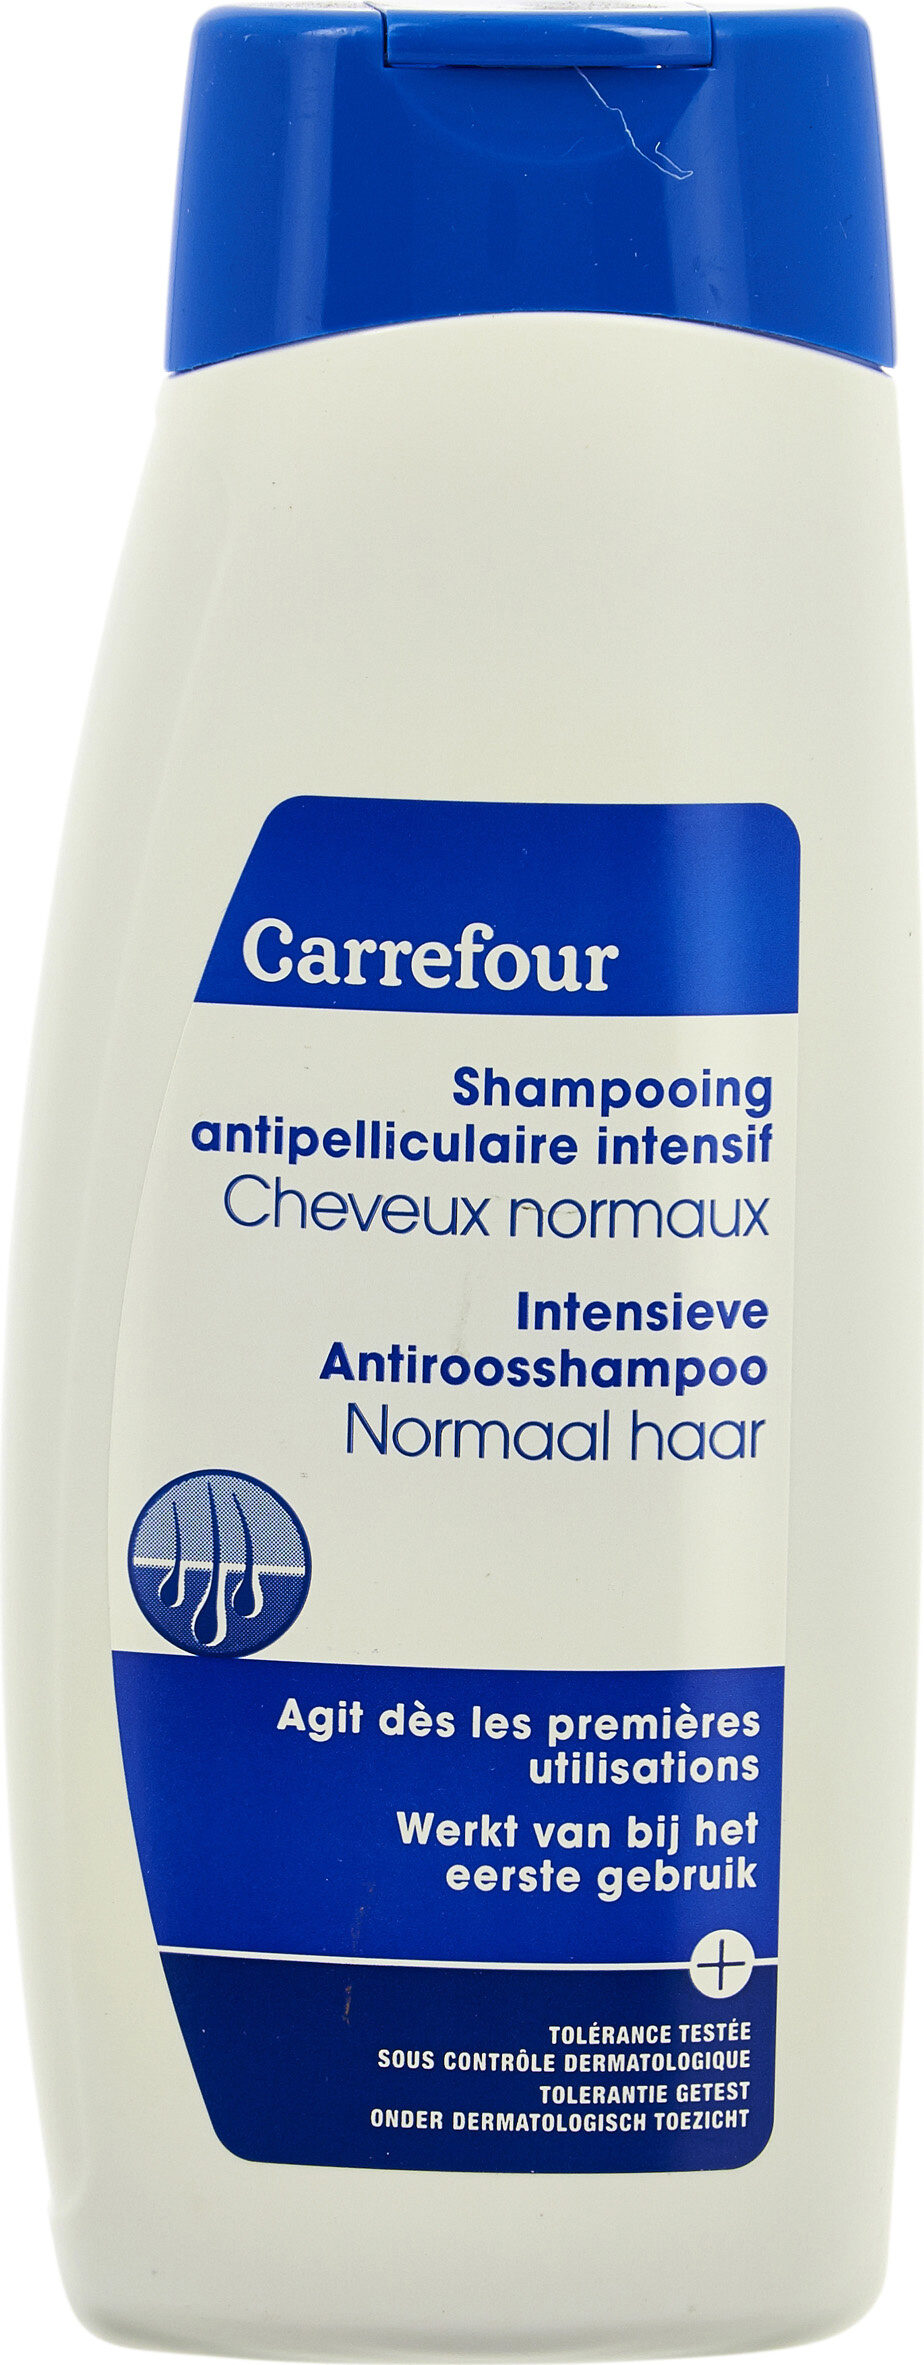 Shampooing antipelliculaire intensif - Produit - fr